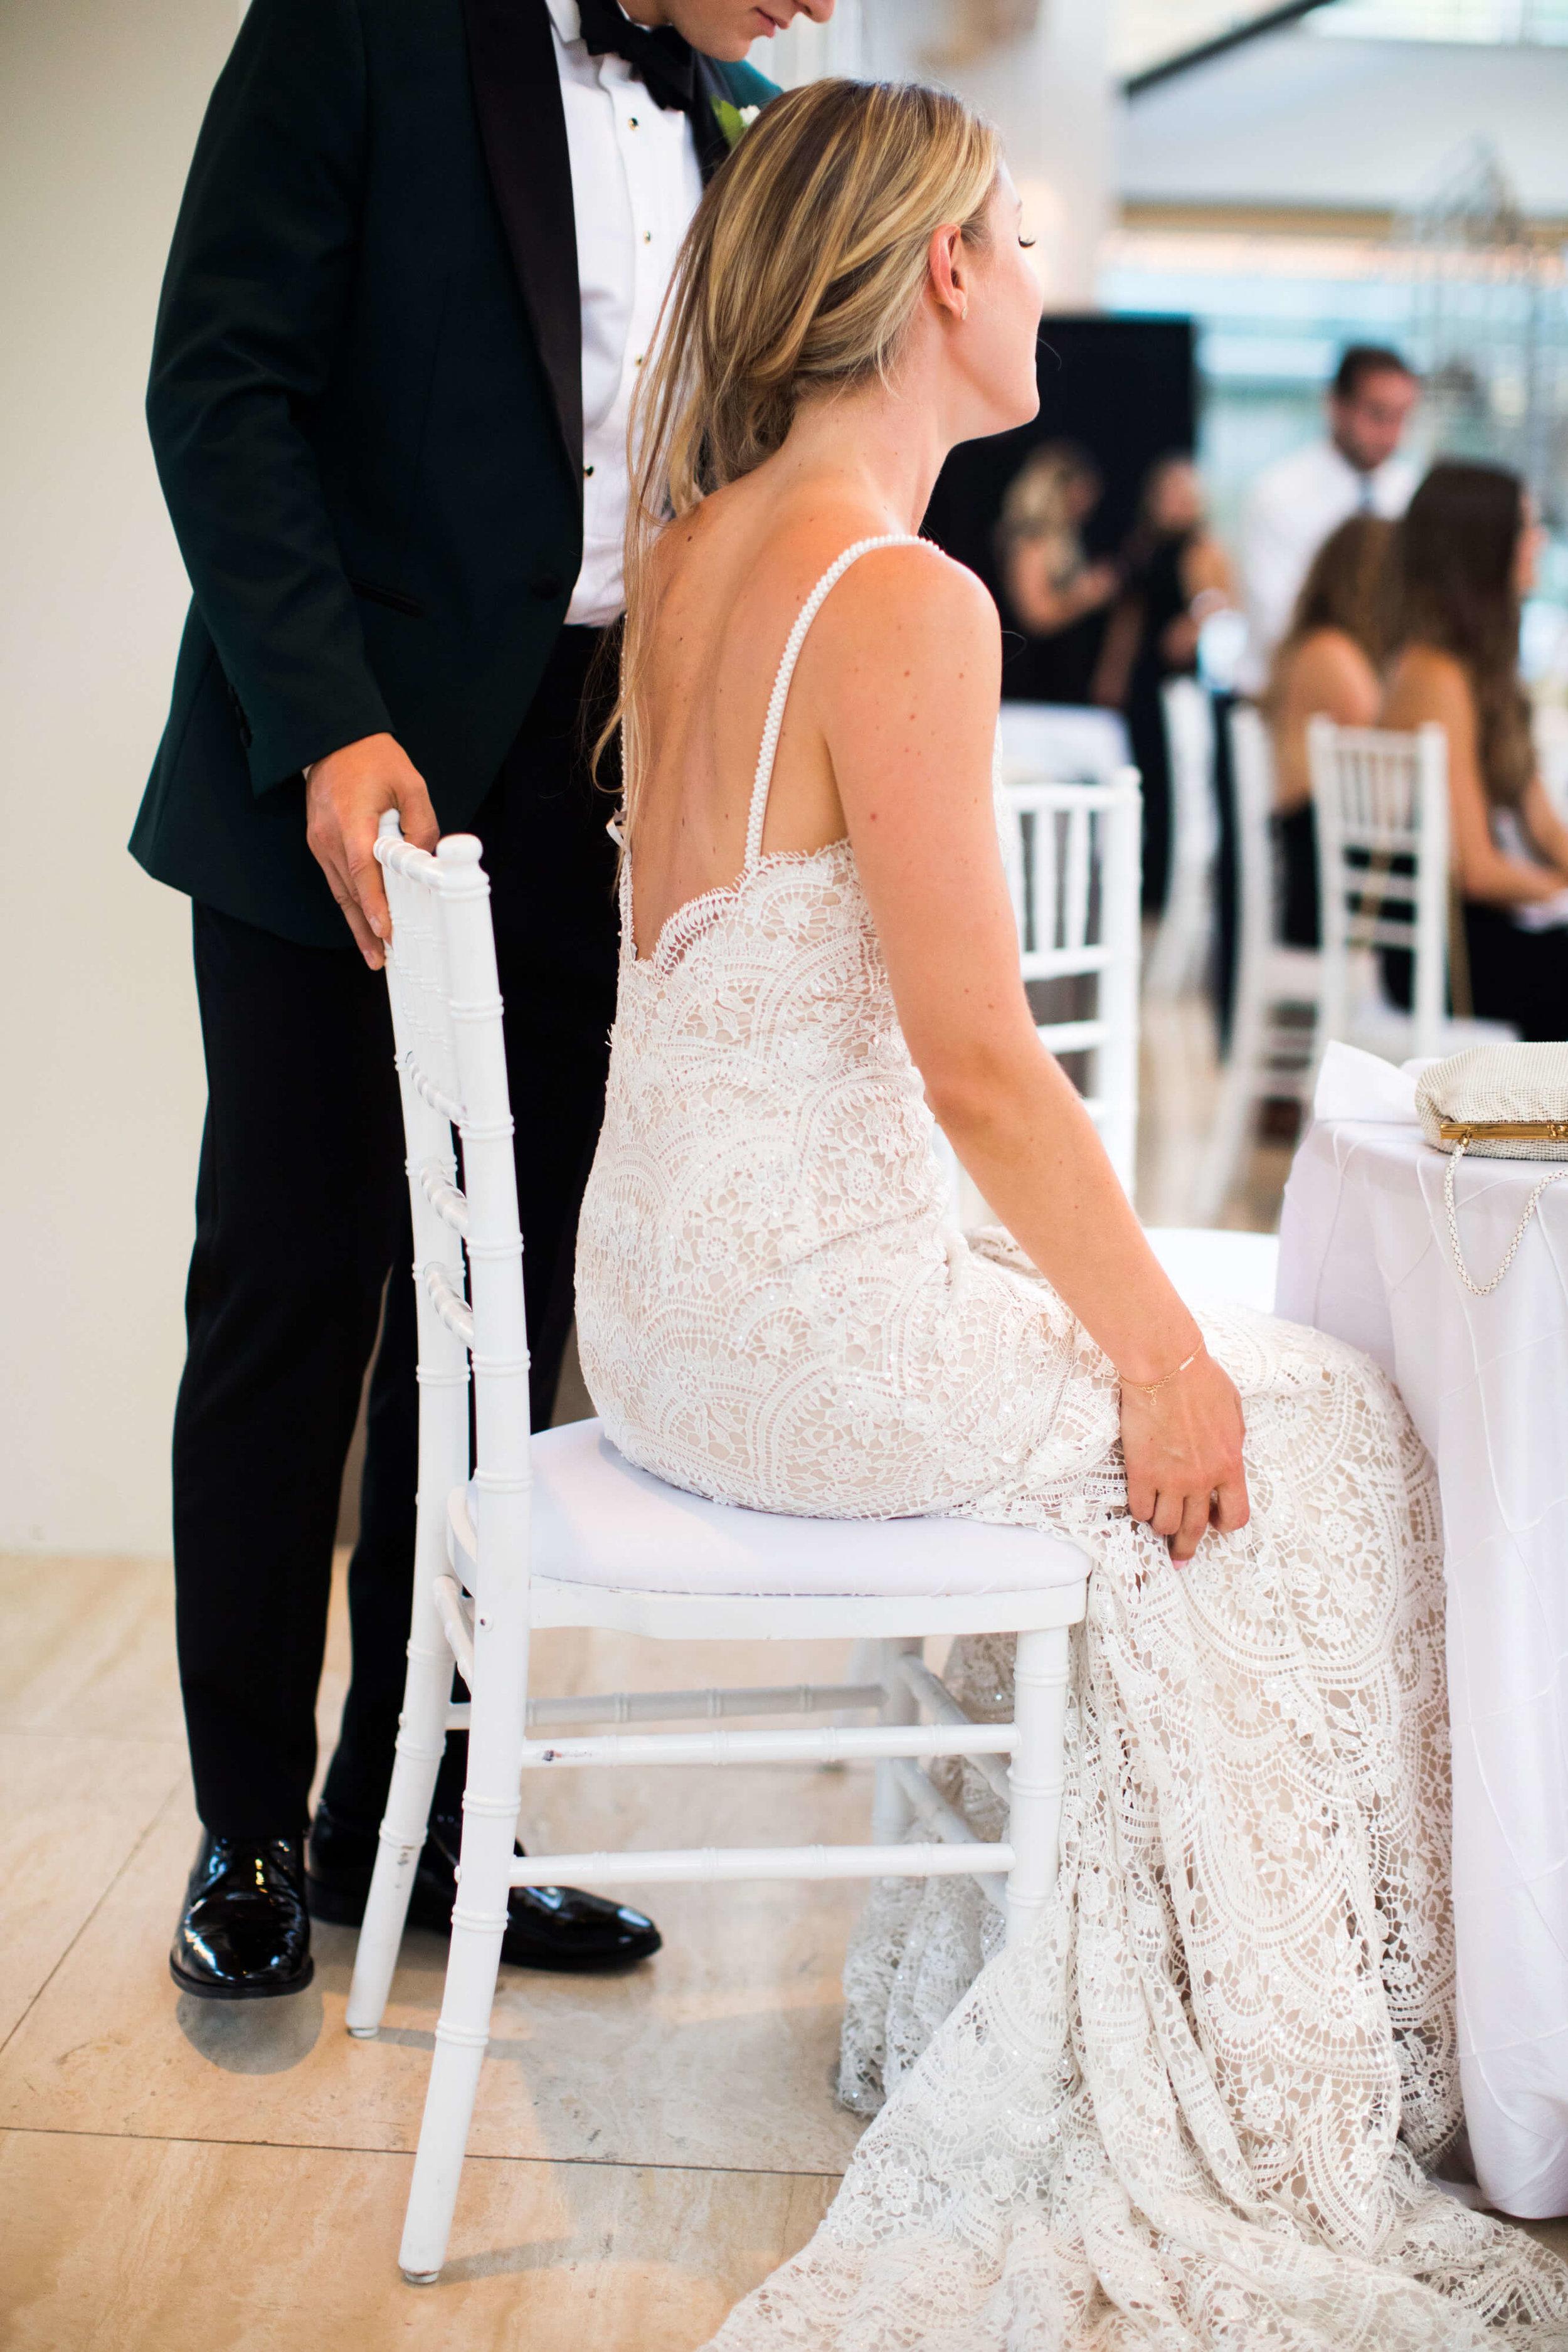 groom pushing bride into table with chair chiavari | Minnesota wedding photographer Studio KH wedding dress details | wedding blog | Sixpence Events 70 Ways to Photograph Your Wedding Dress.jpg